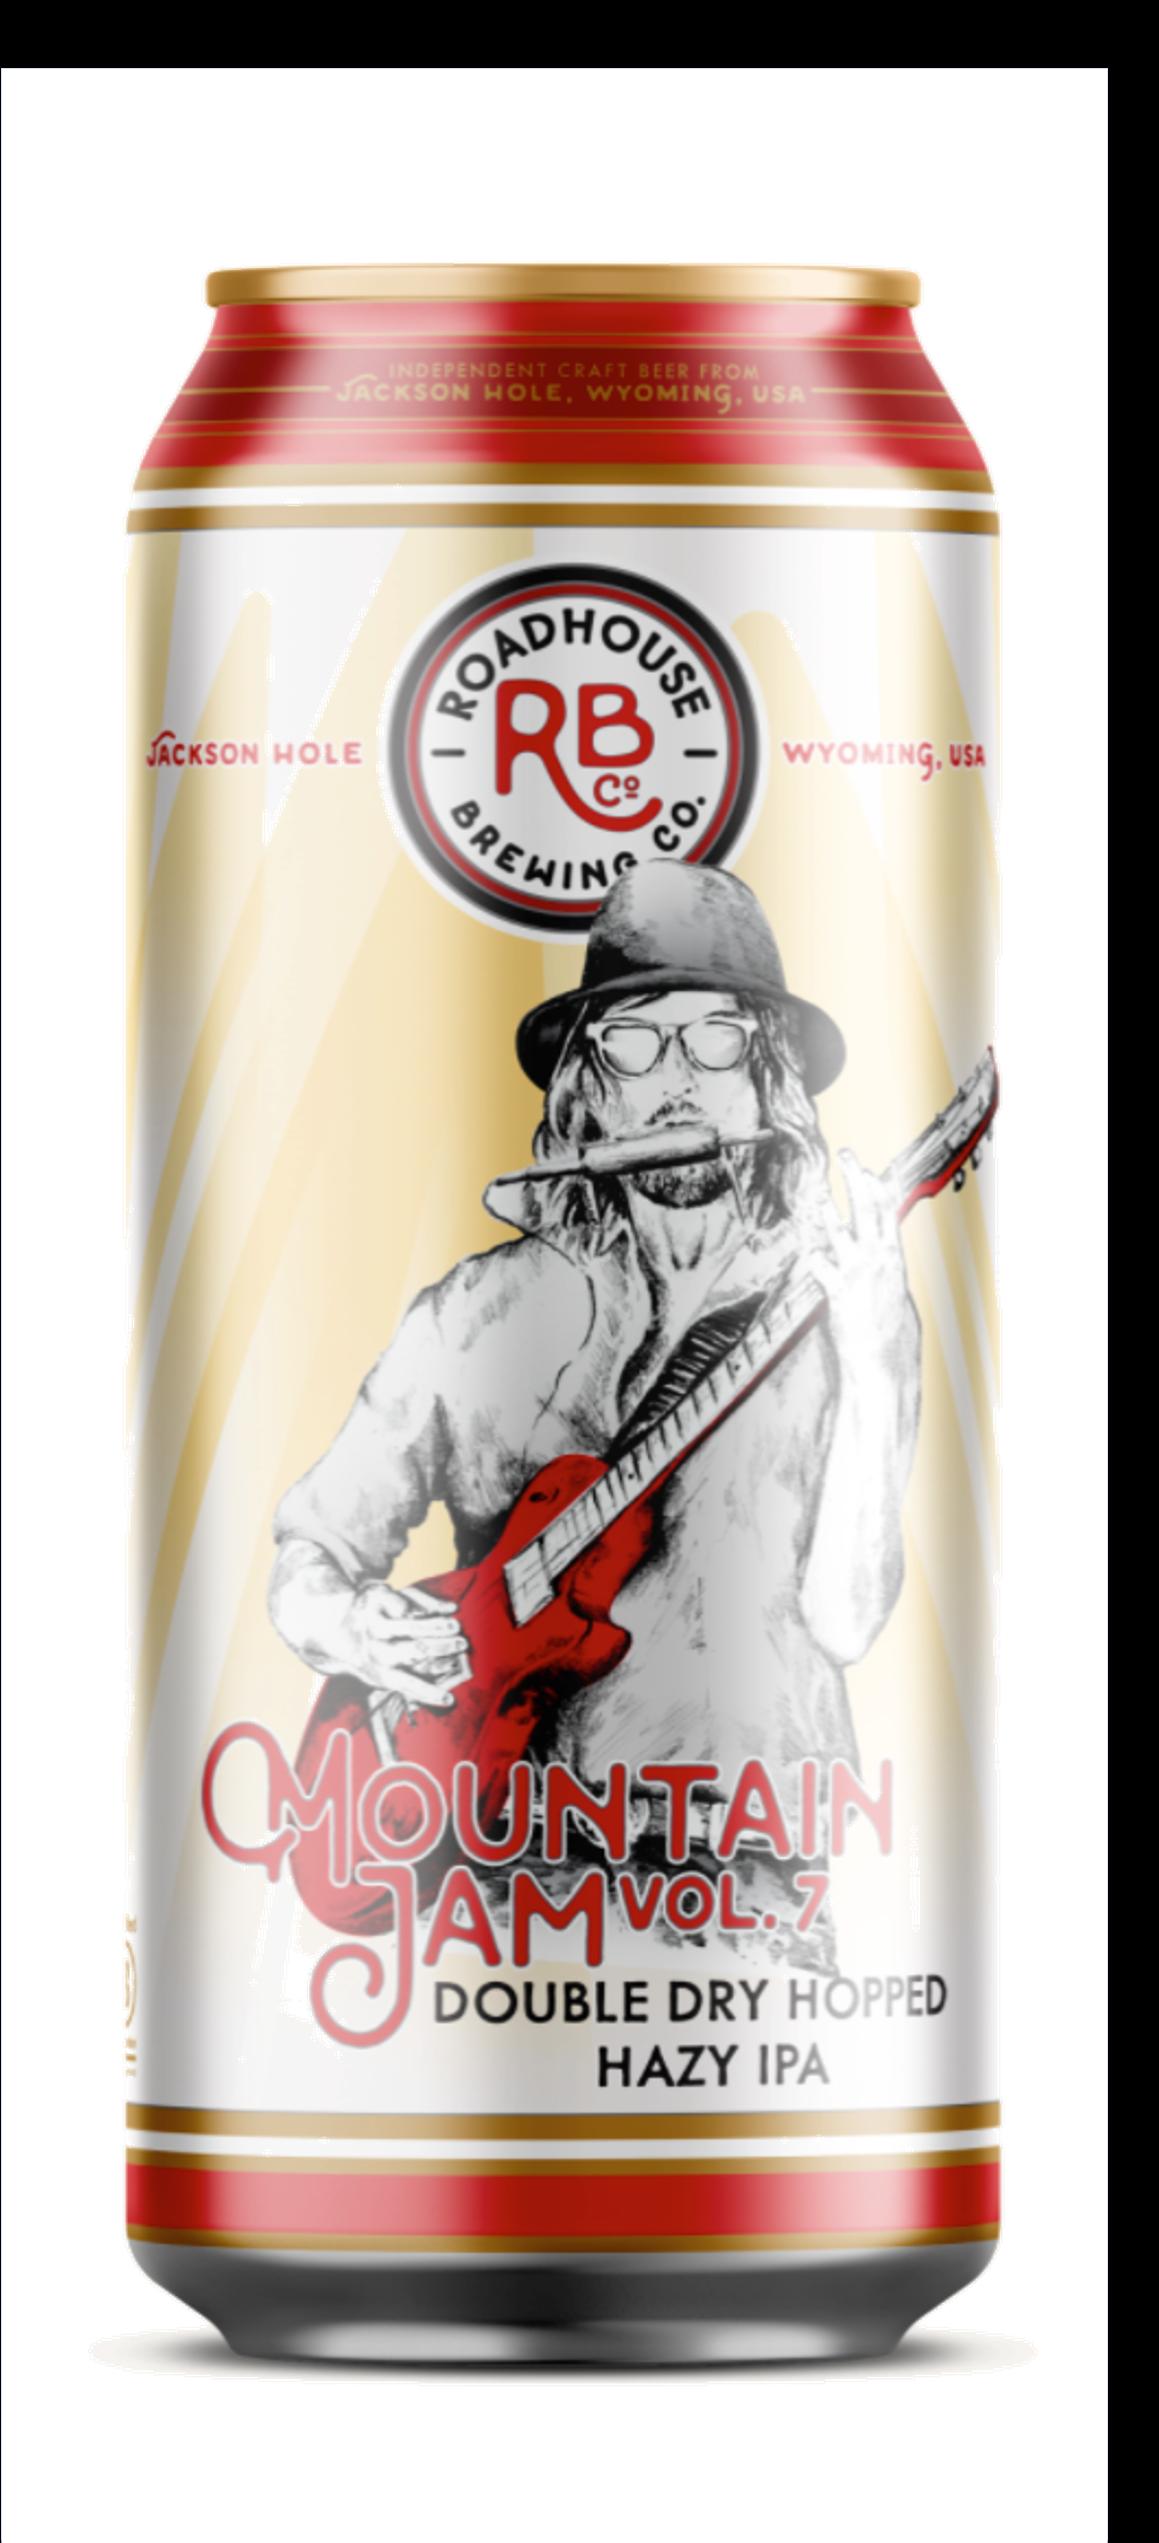 Mountain Jam vol. 7